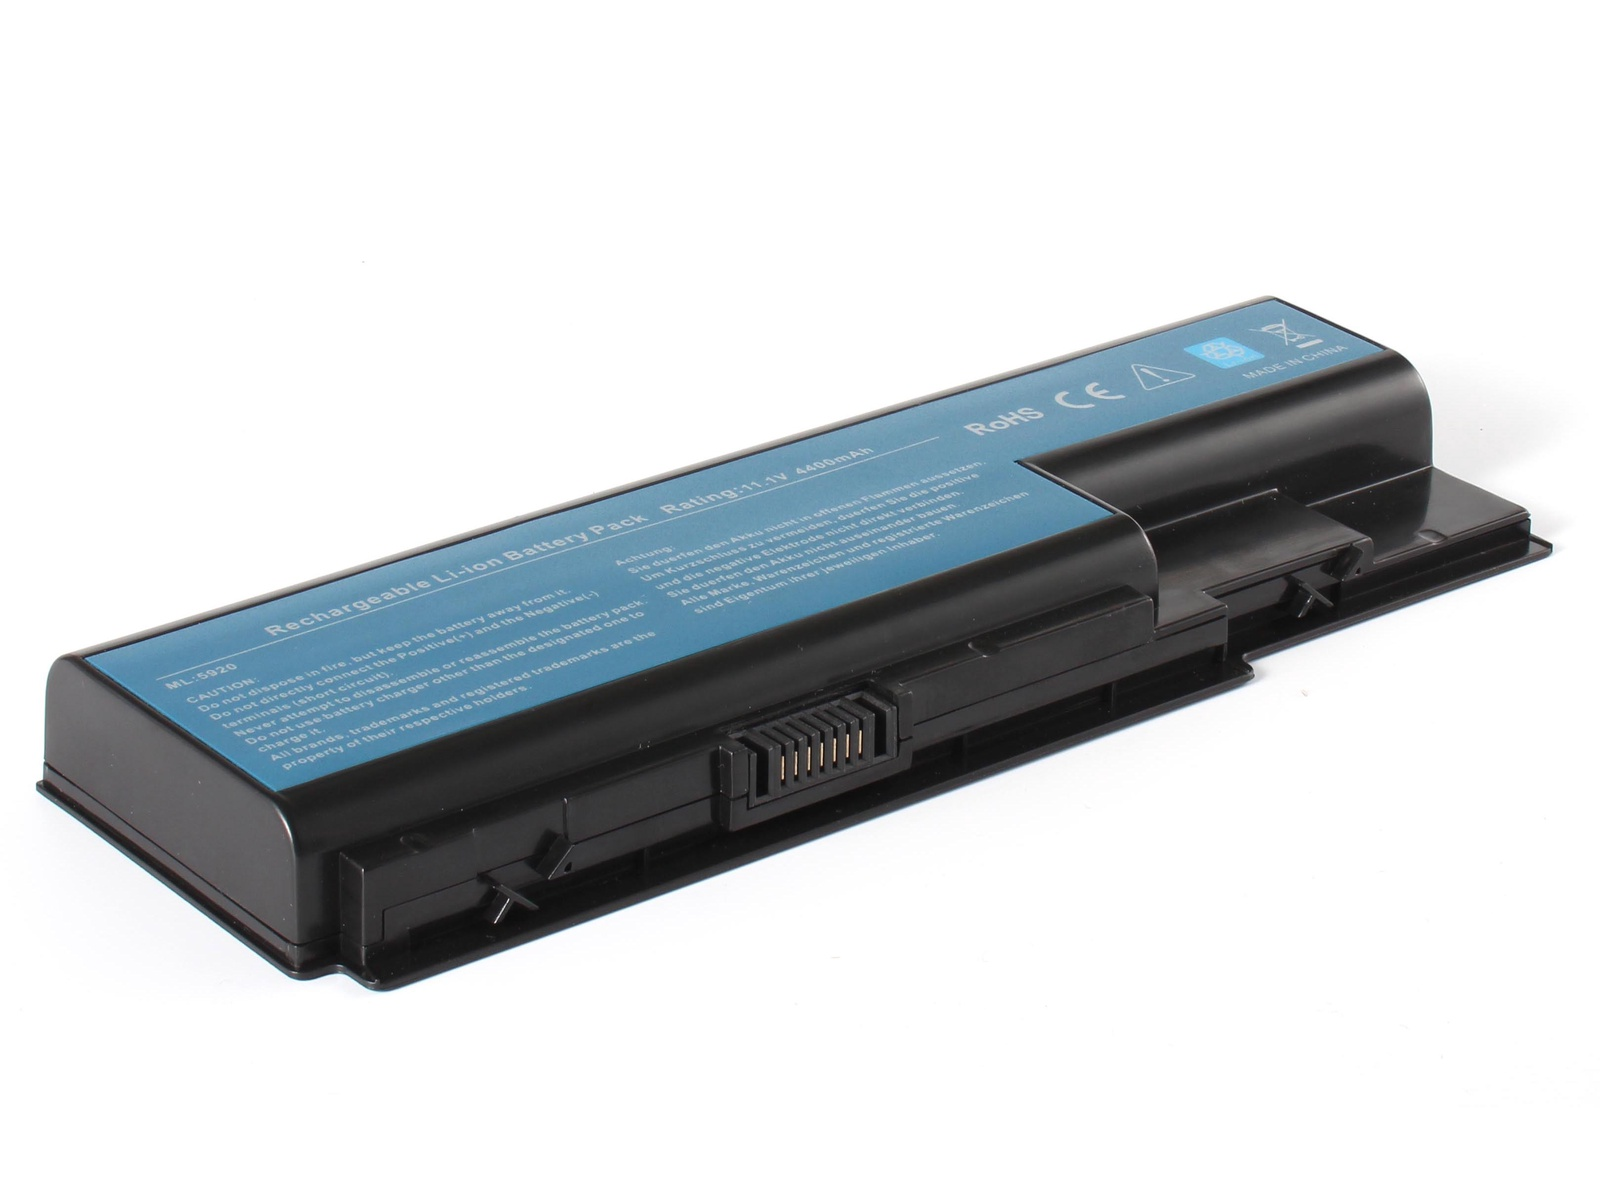 Аккумулятор для ноутбука AnyBatt для Acer Aspire 7220, Aspire 5940G, Aspire 8735G, Aspire 7530, Aspire 7535G, Aspire 7740G, Aspire 5710, Aspire 8935G, Extensa 7230E, Aspire 5730, Aspire 7738, Aspire 8530G-654G32Mi, Extensa 7230 acer aspire switch 10